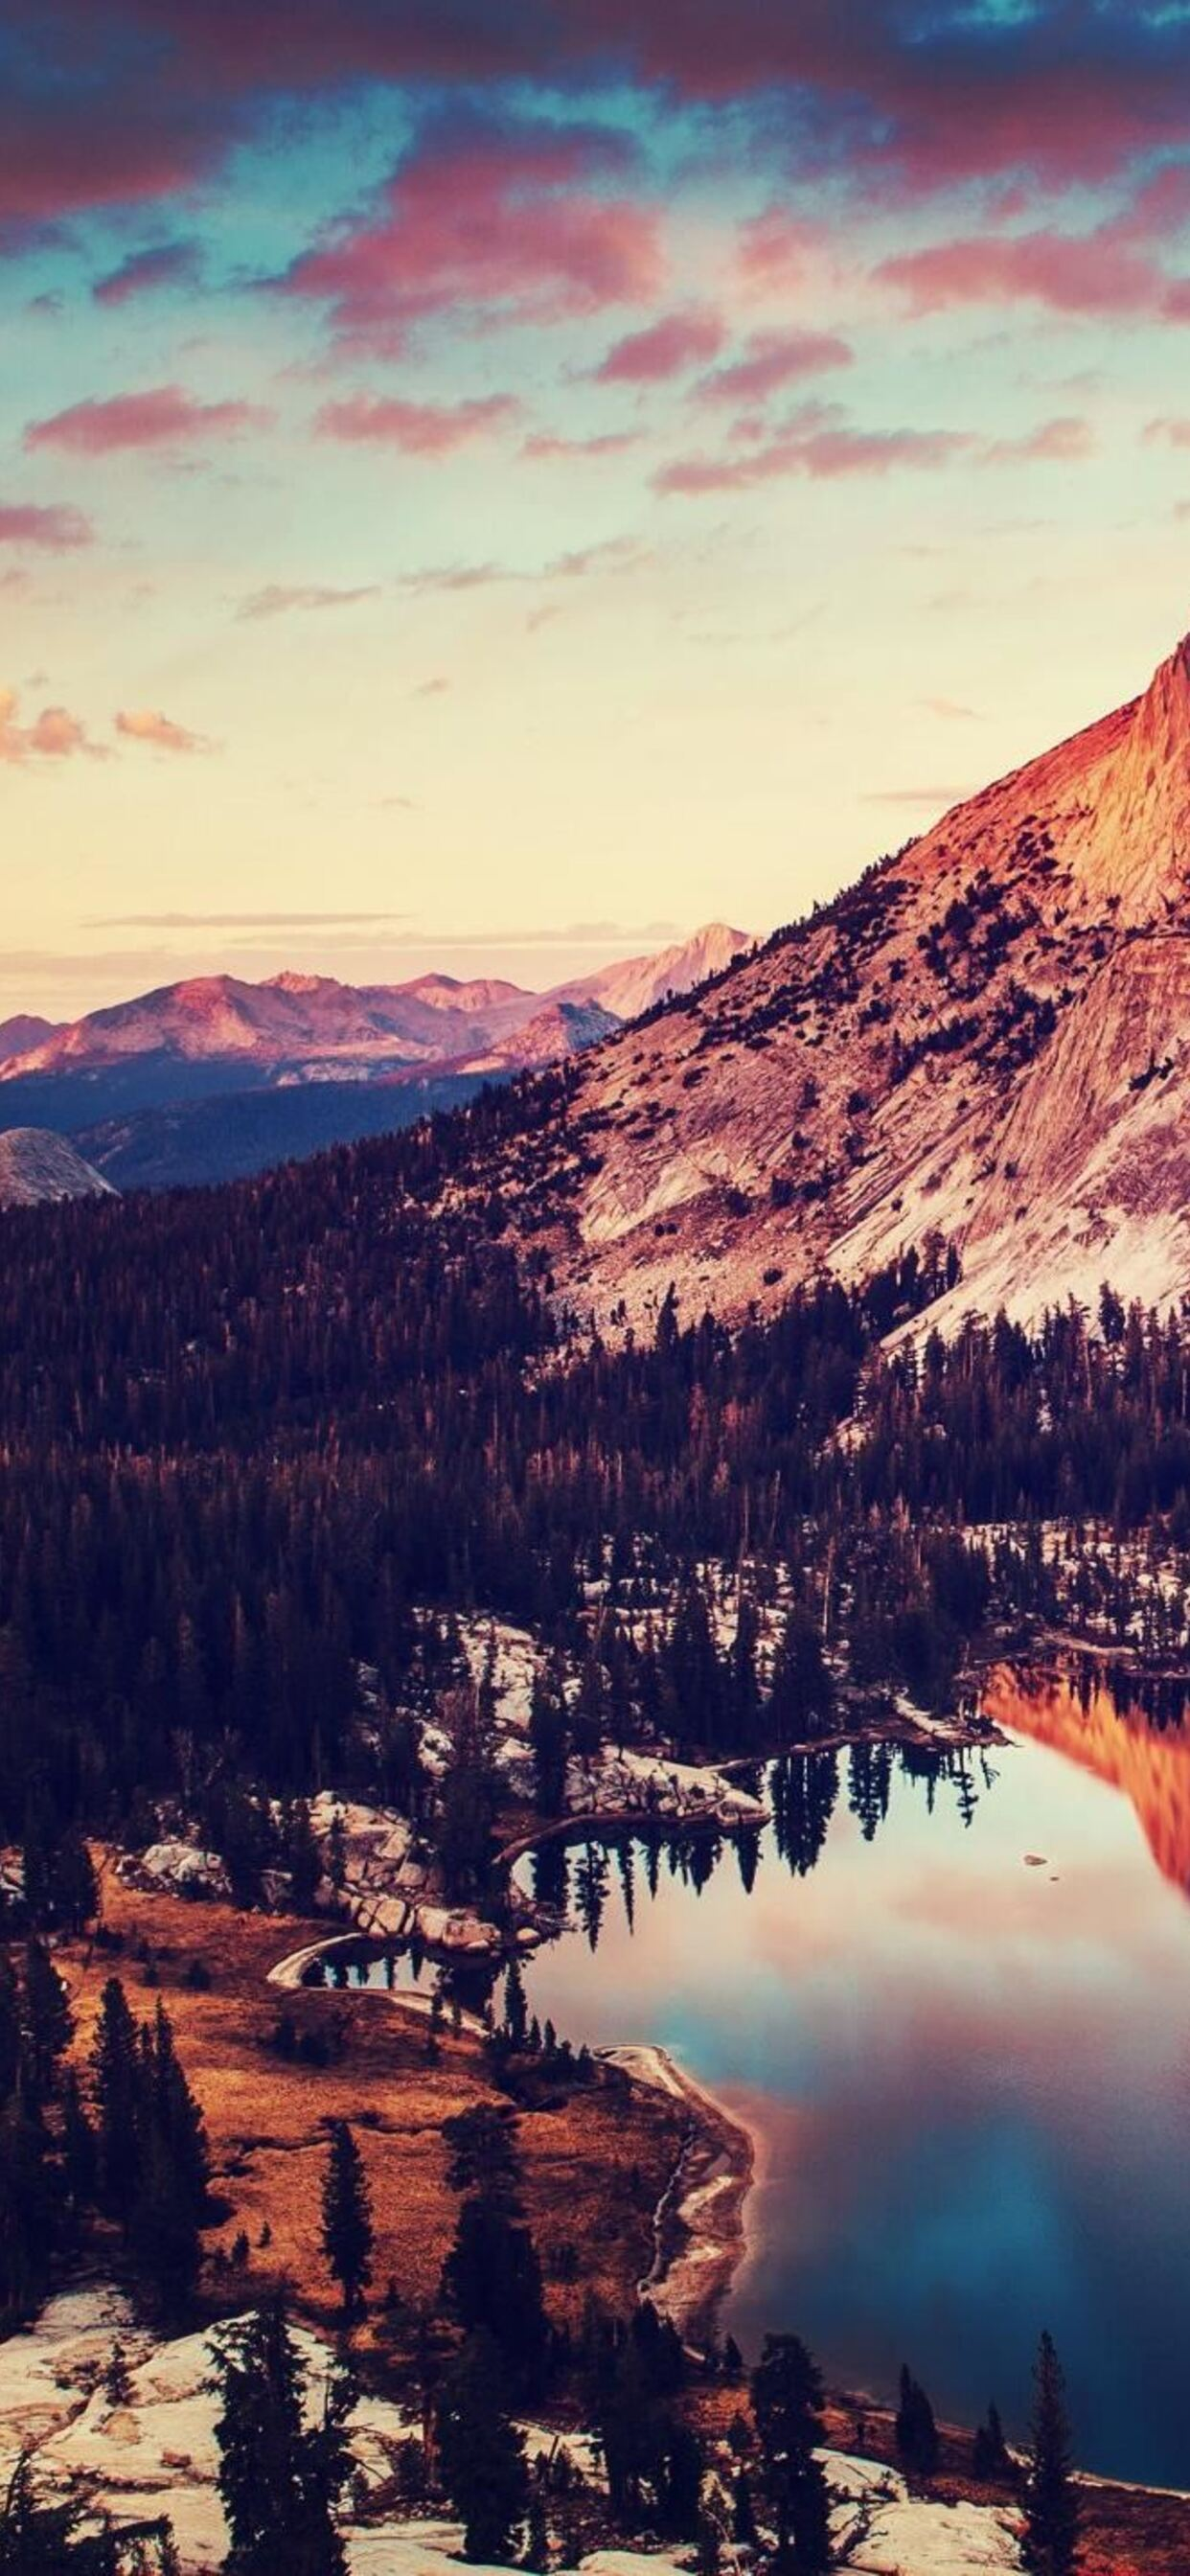 yosemite-national-park-california-new.jpg